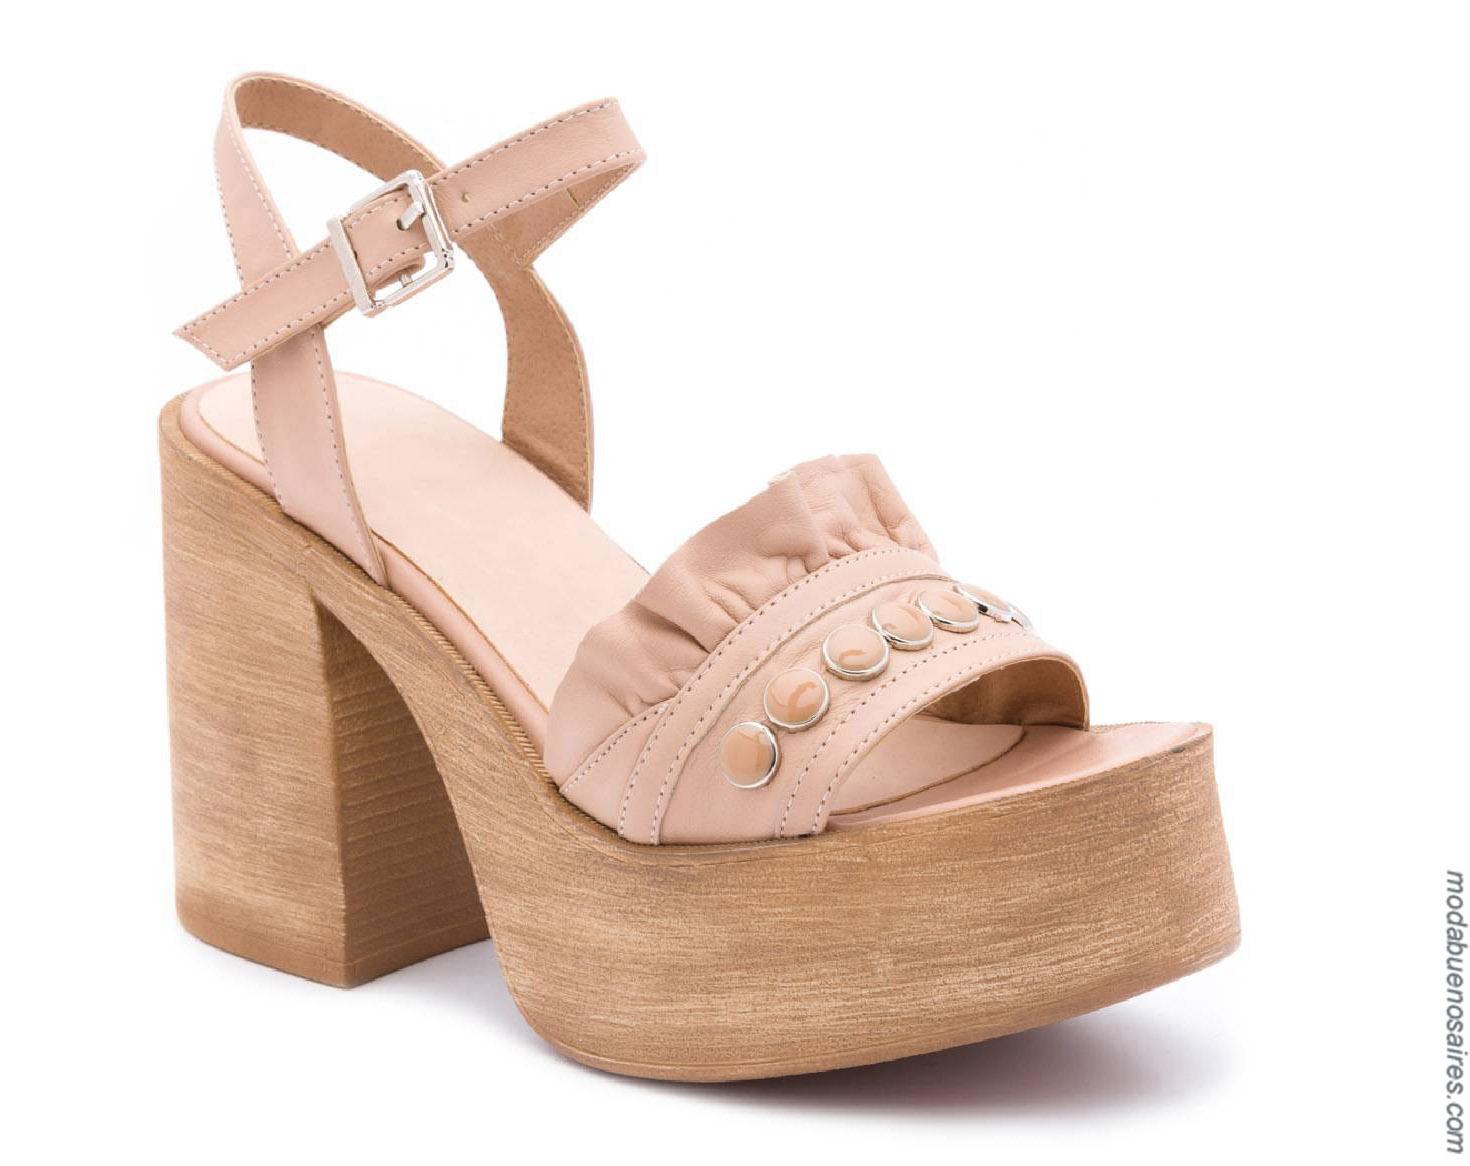 Sandalias de mujer taco cuadrado primavera verano 2020.